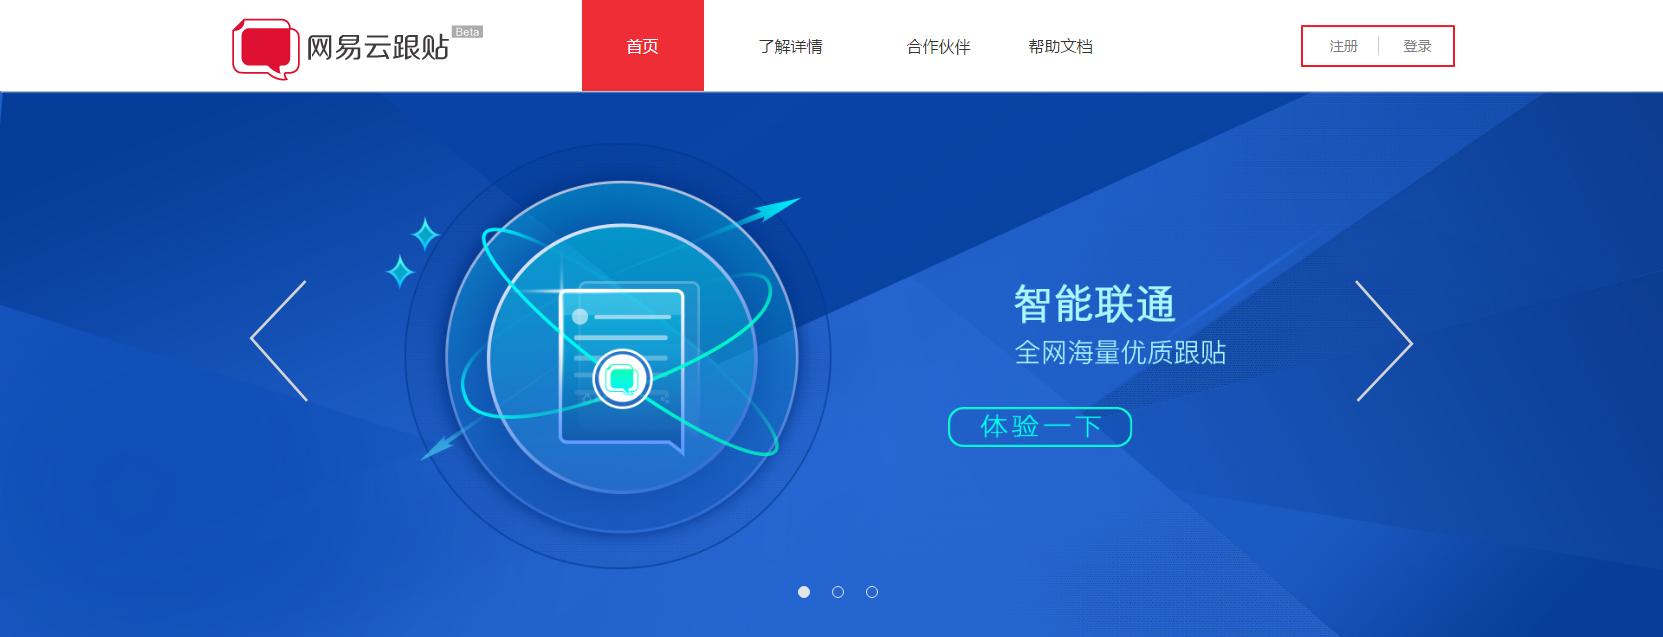 Discuz门户网易云跟帖代码接入教程